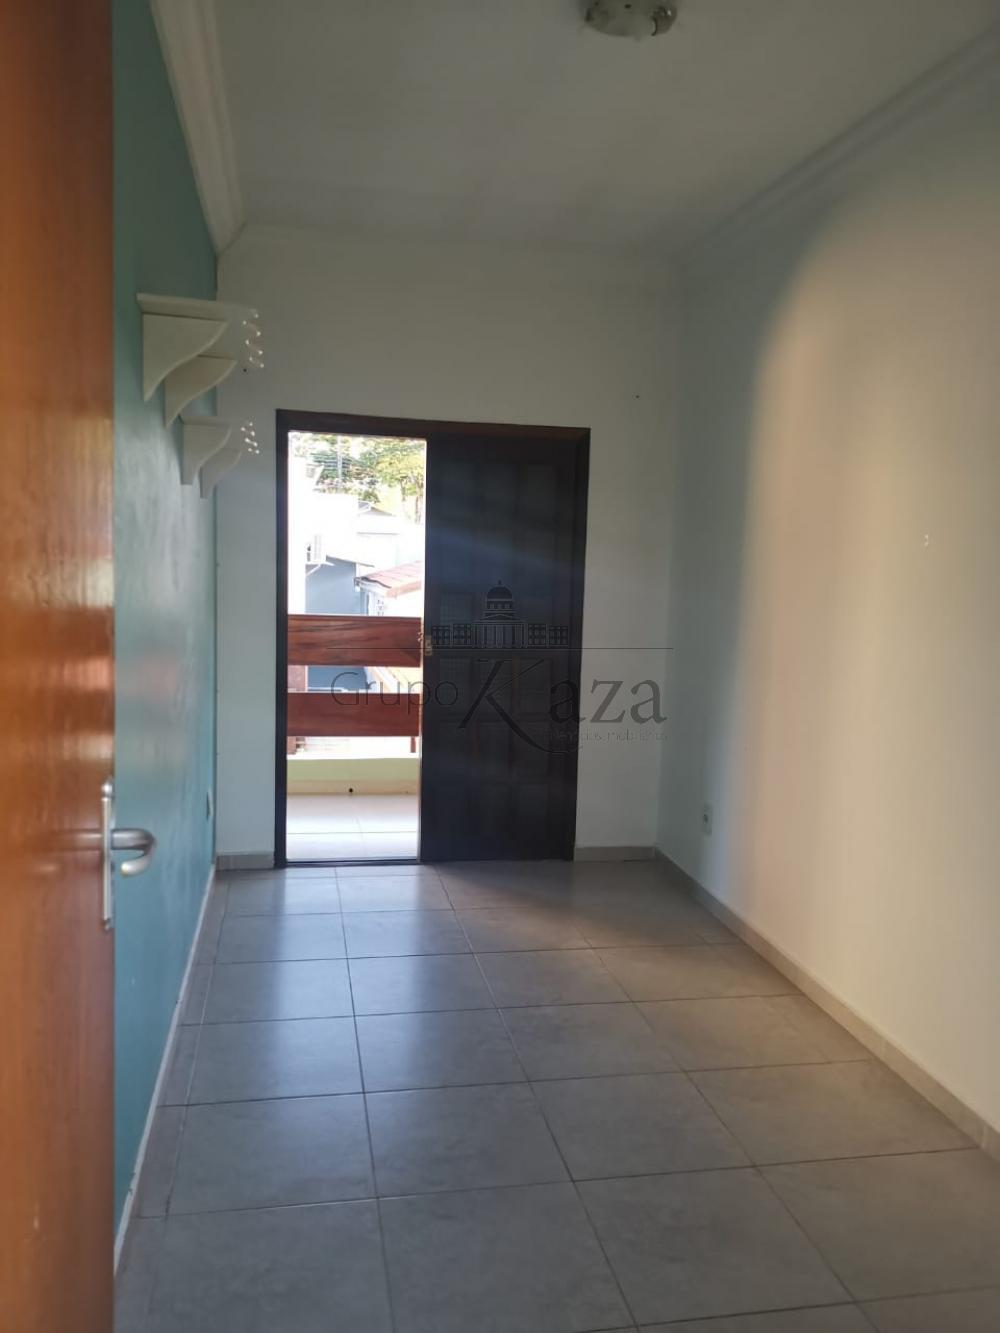 Alugar Comercial/Industrial / Casa em São José dos Campos R$ 3.000,00 - Foto 29